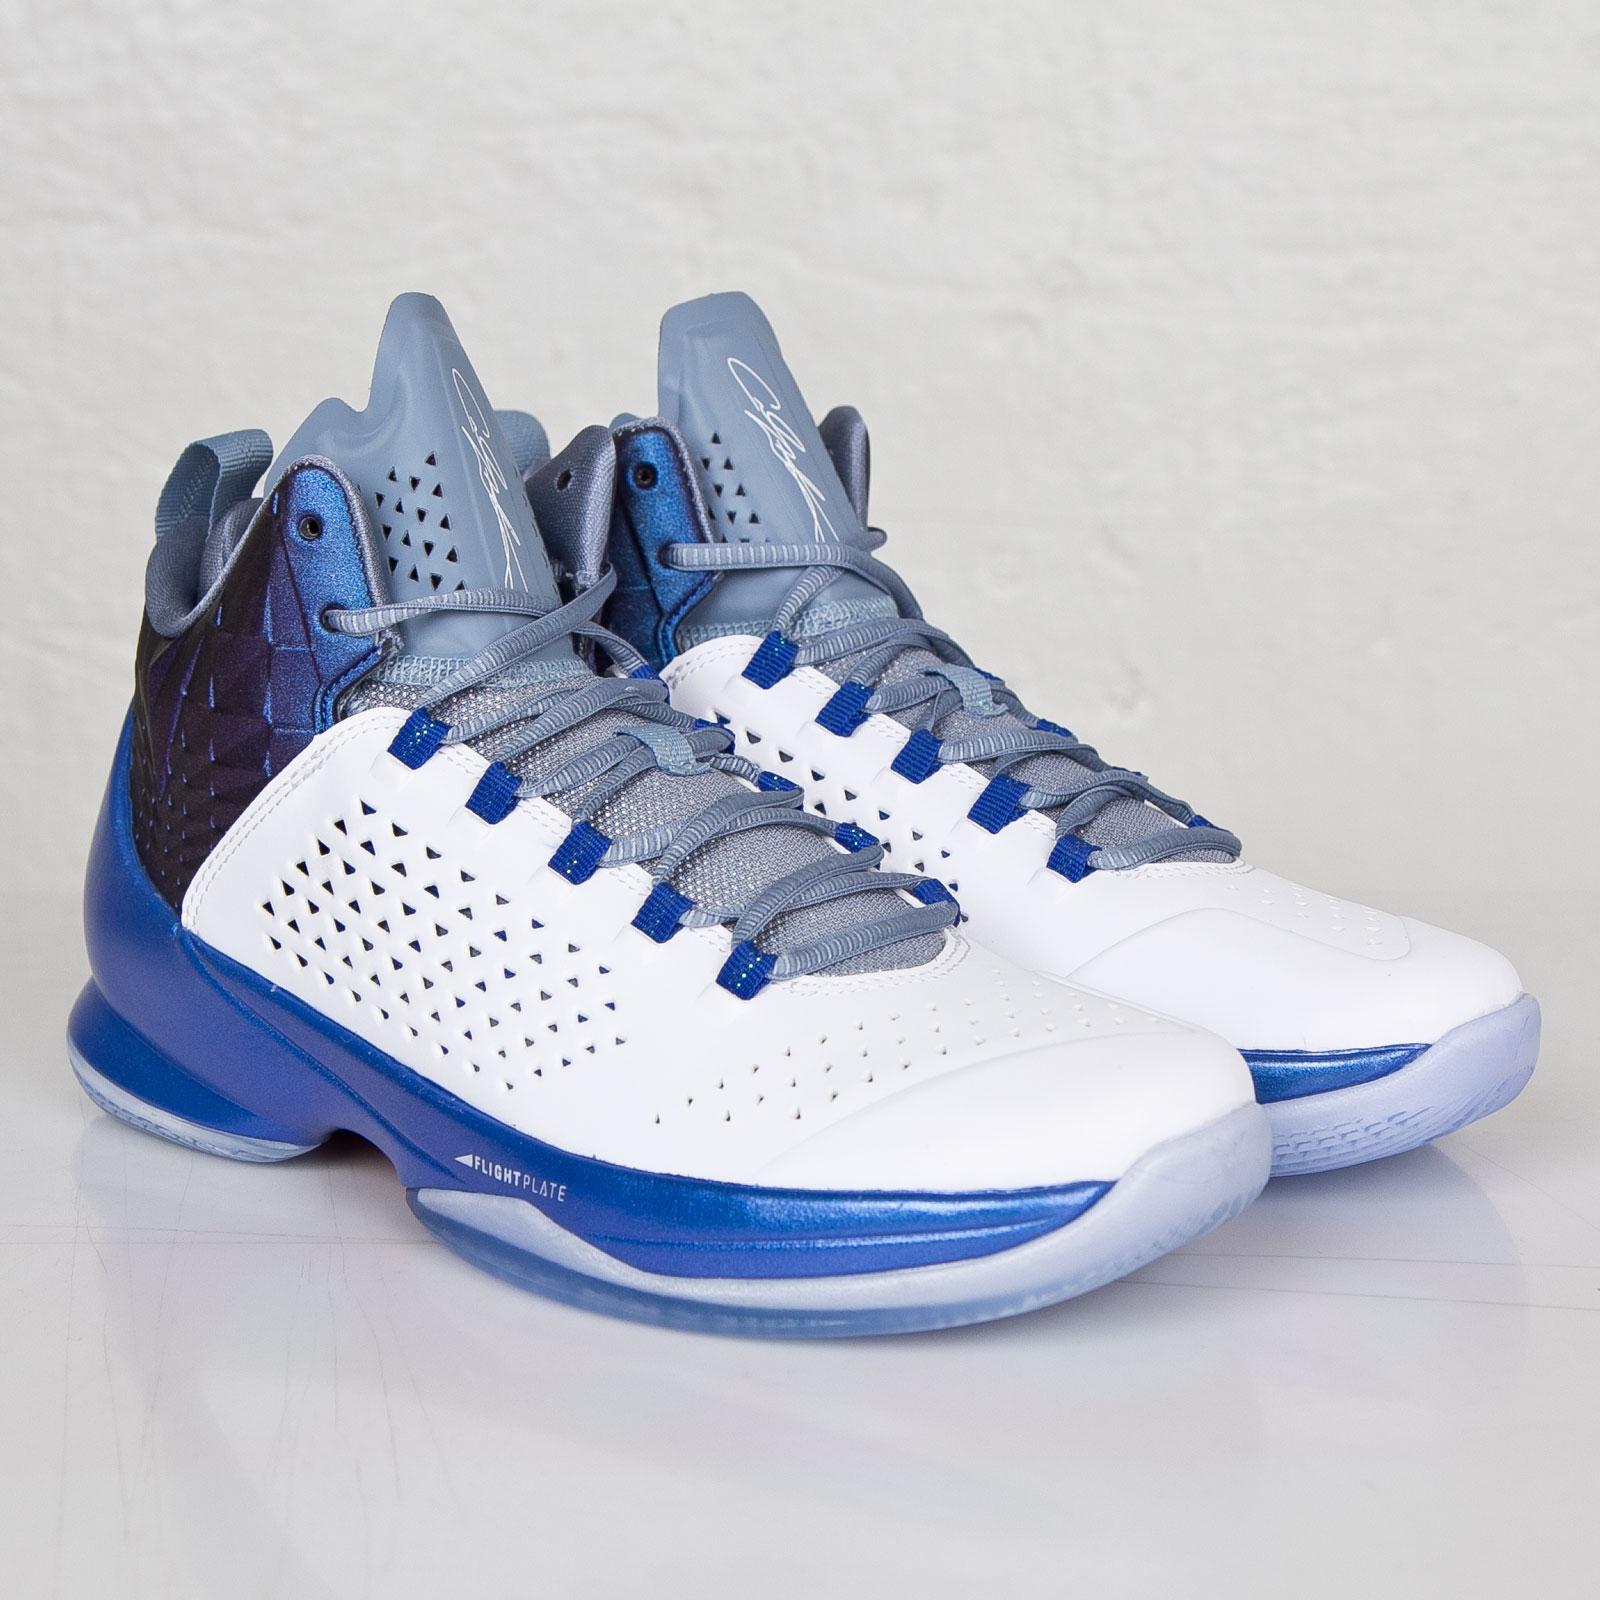 Jordan Brand Jordan Melo 11 - 716227